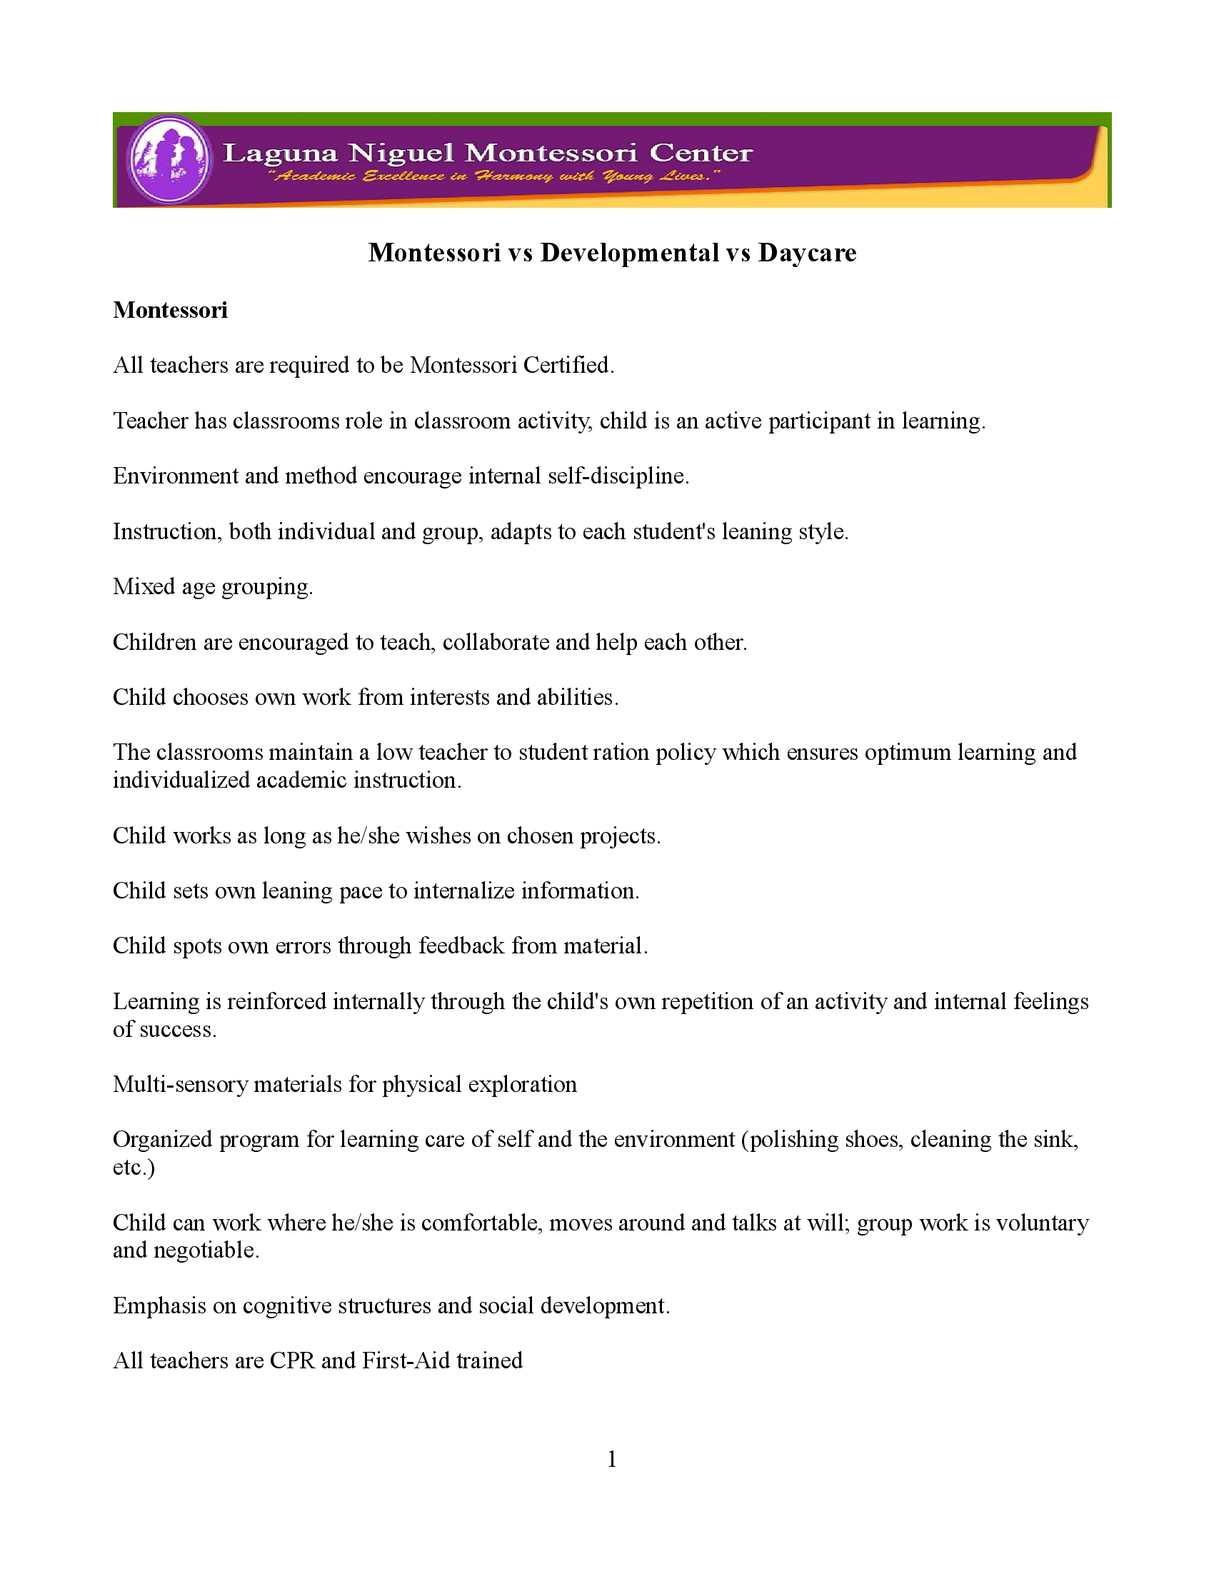 Calaméo Montessori Vs Developmental Vs Daycare